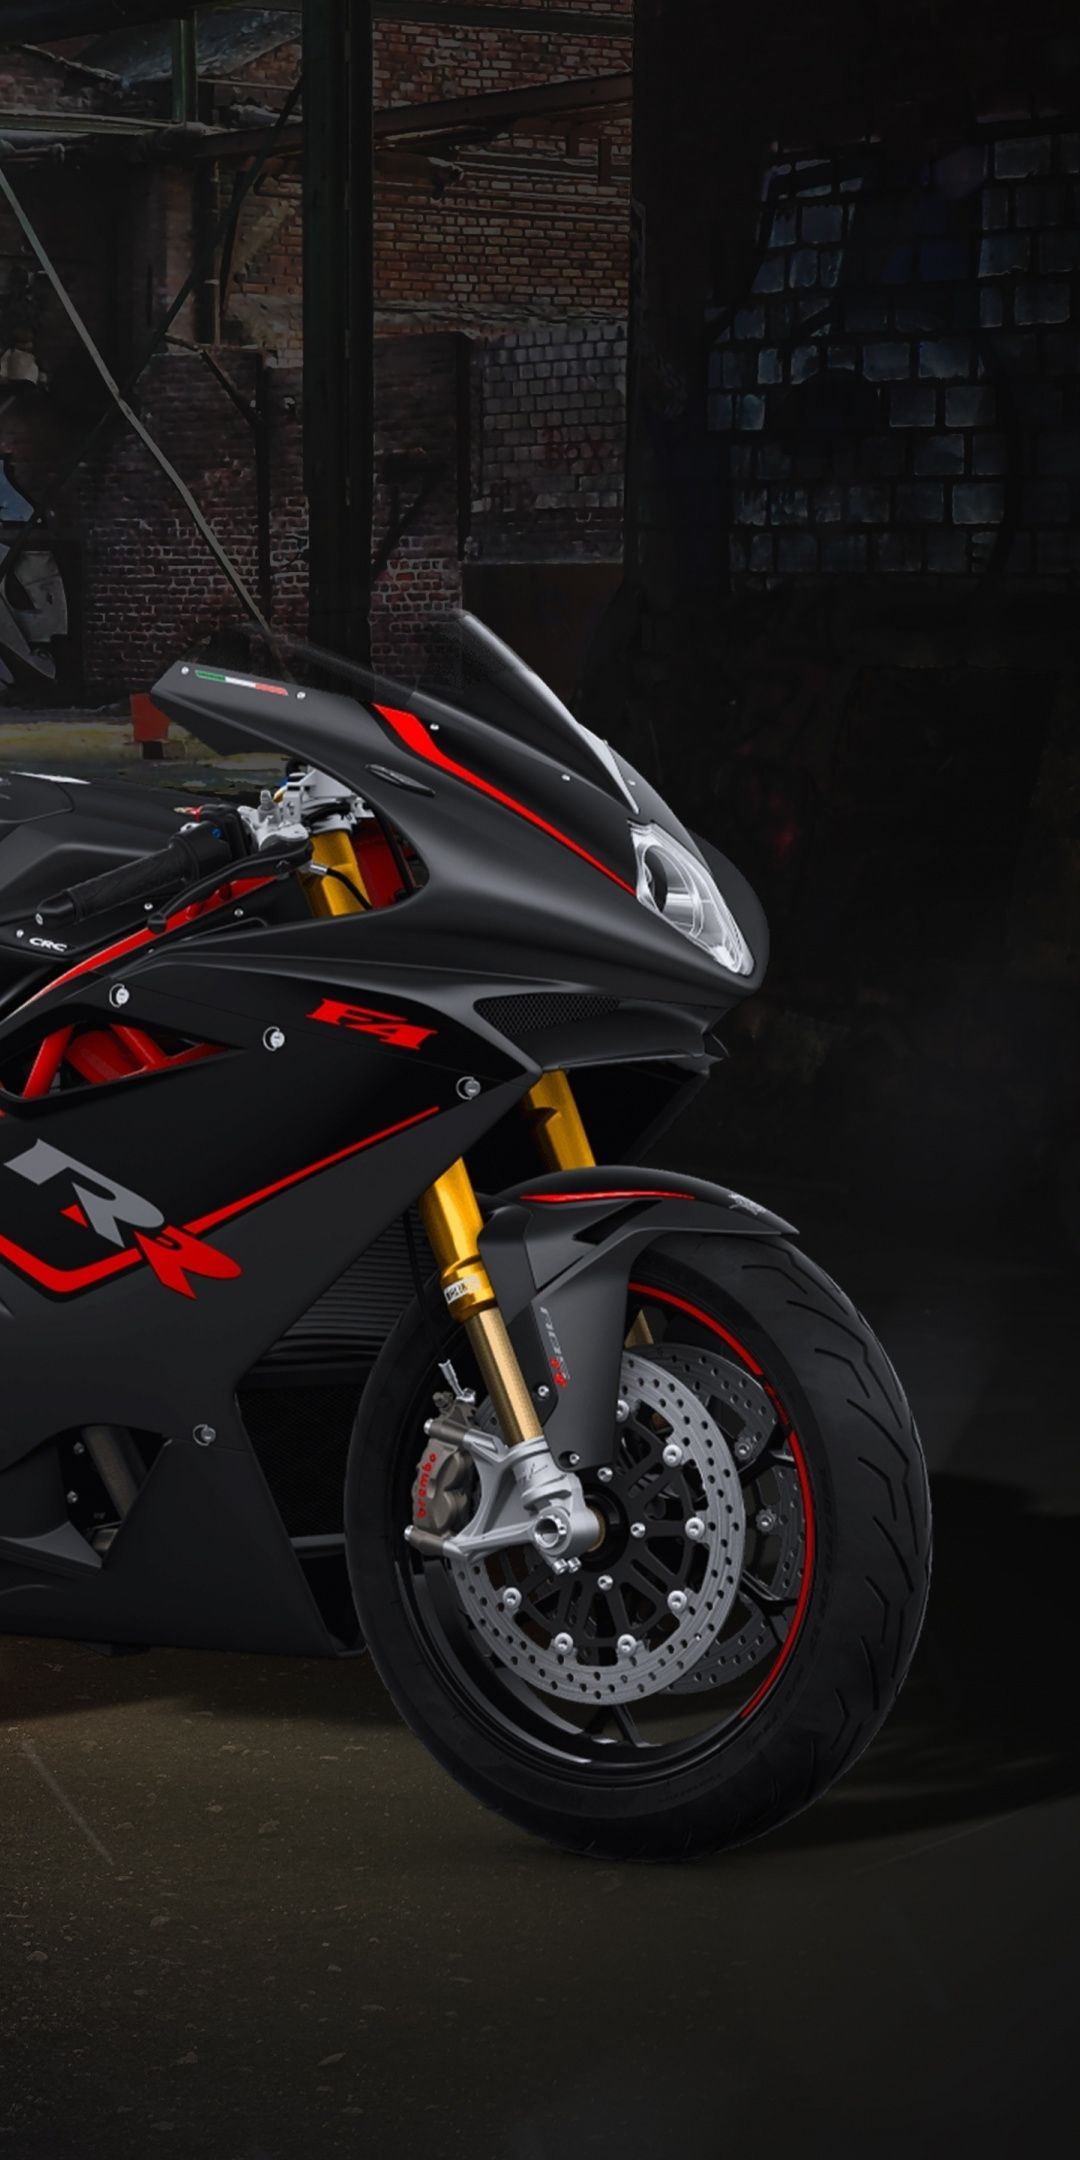 Download 1080x2160 Wallpaper Sports Bike Mv Agusta F4 Honor 7x